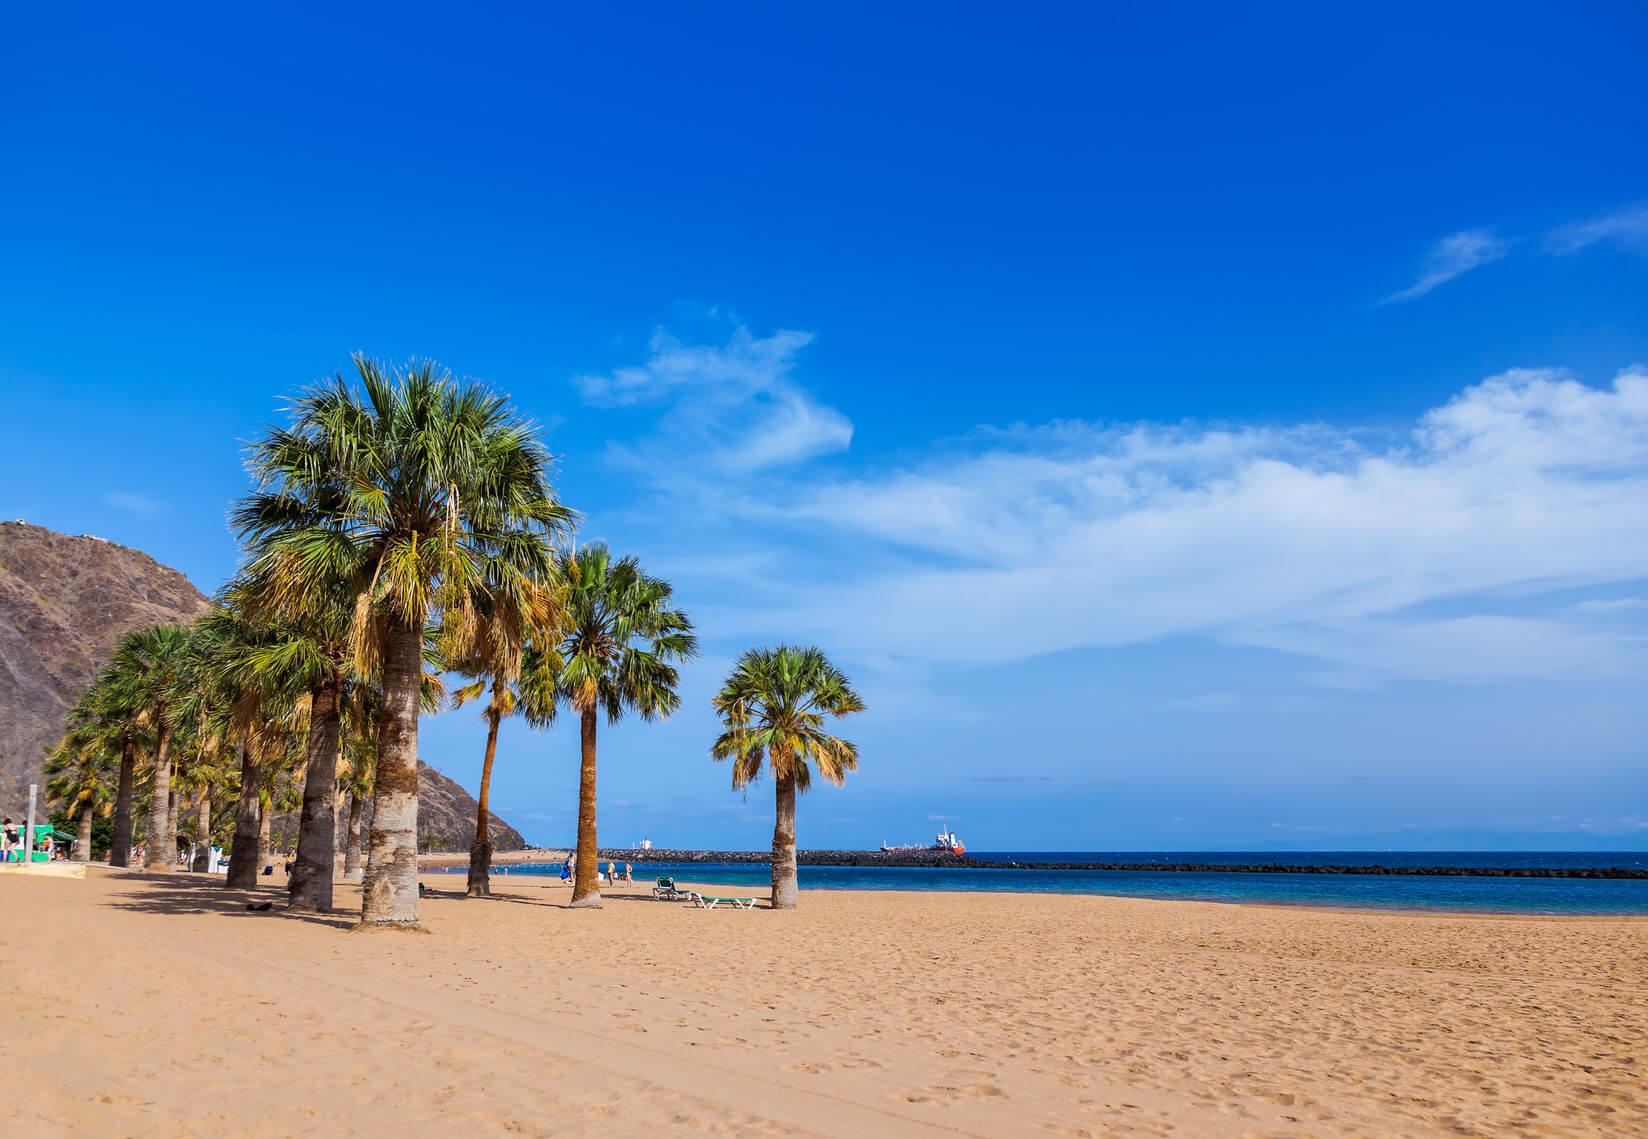 Teneriffa Sandstrand mit Palmen